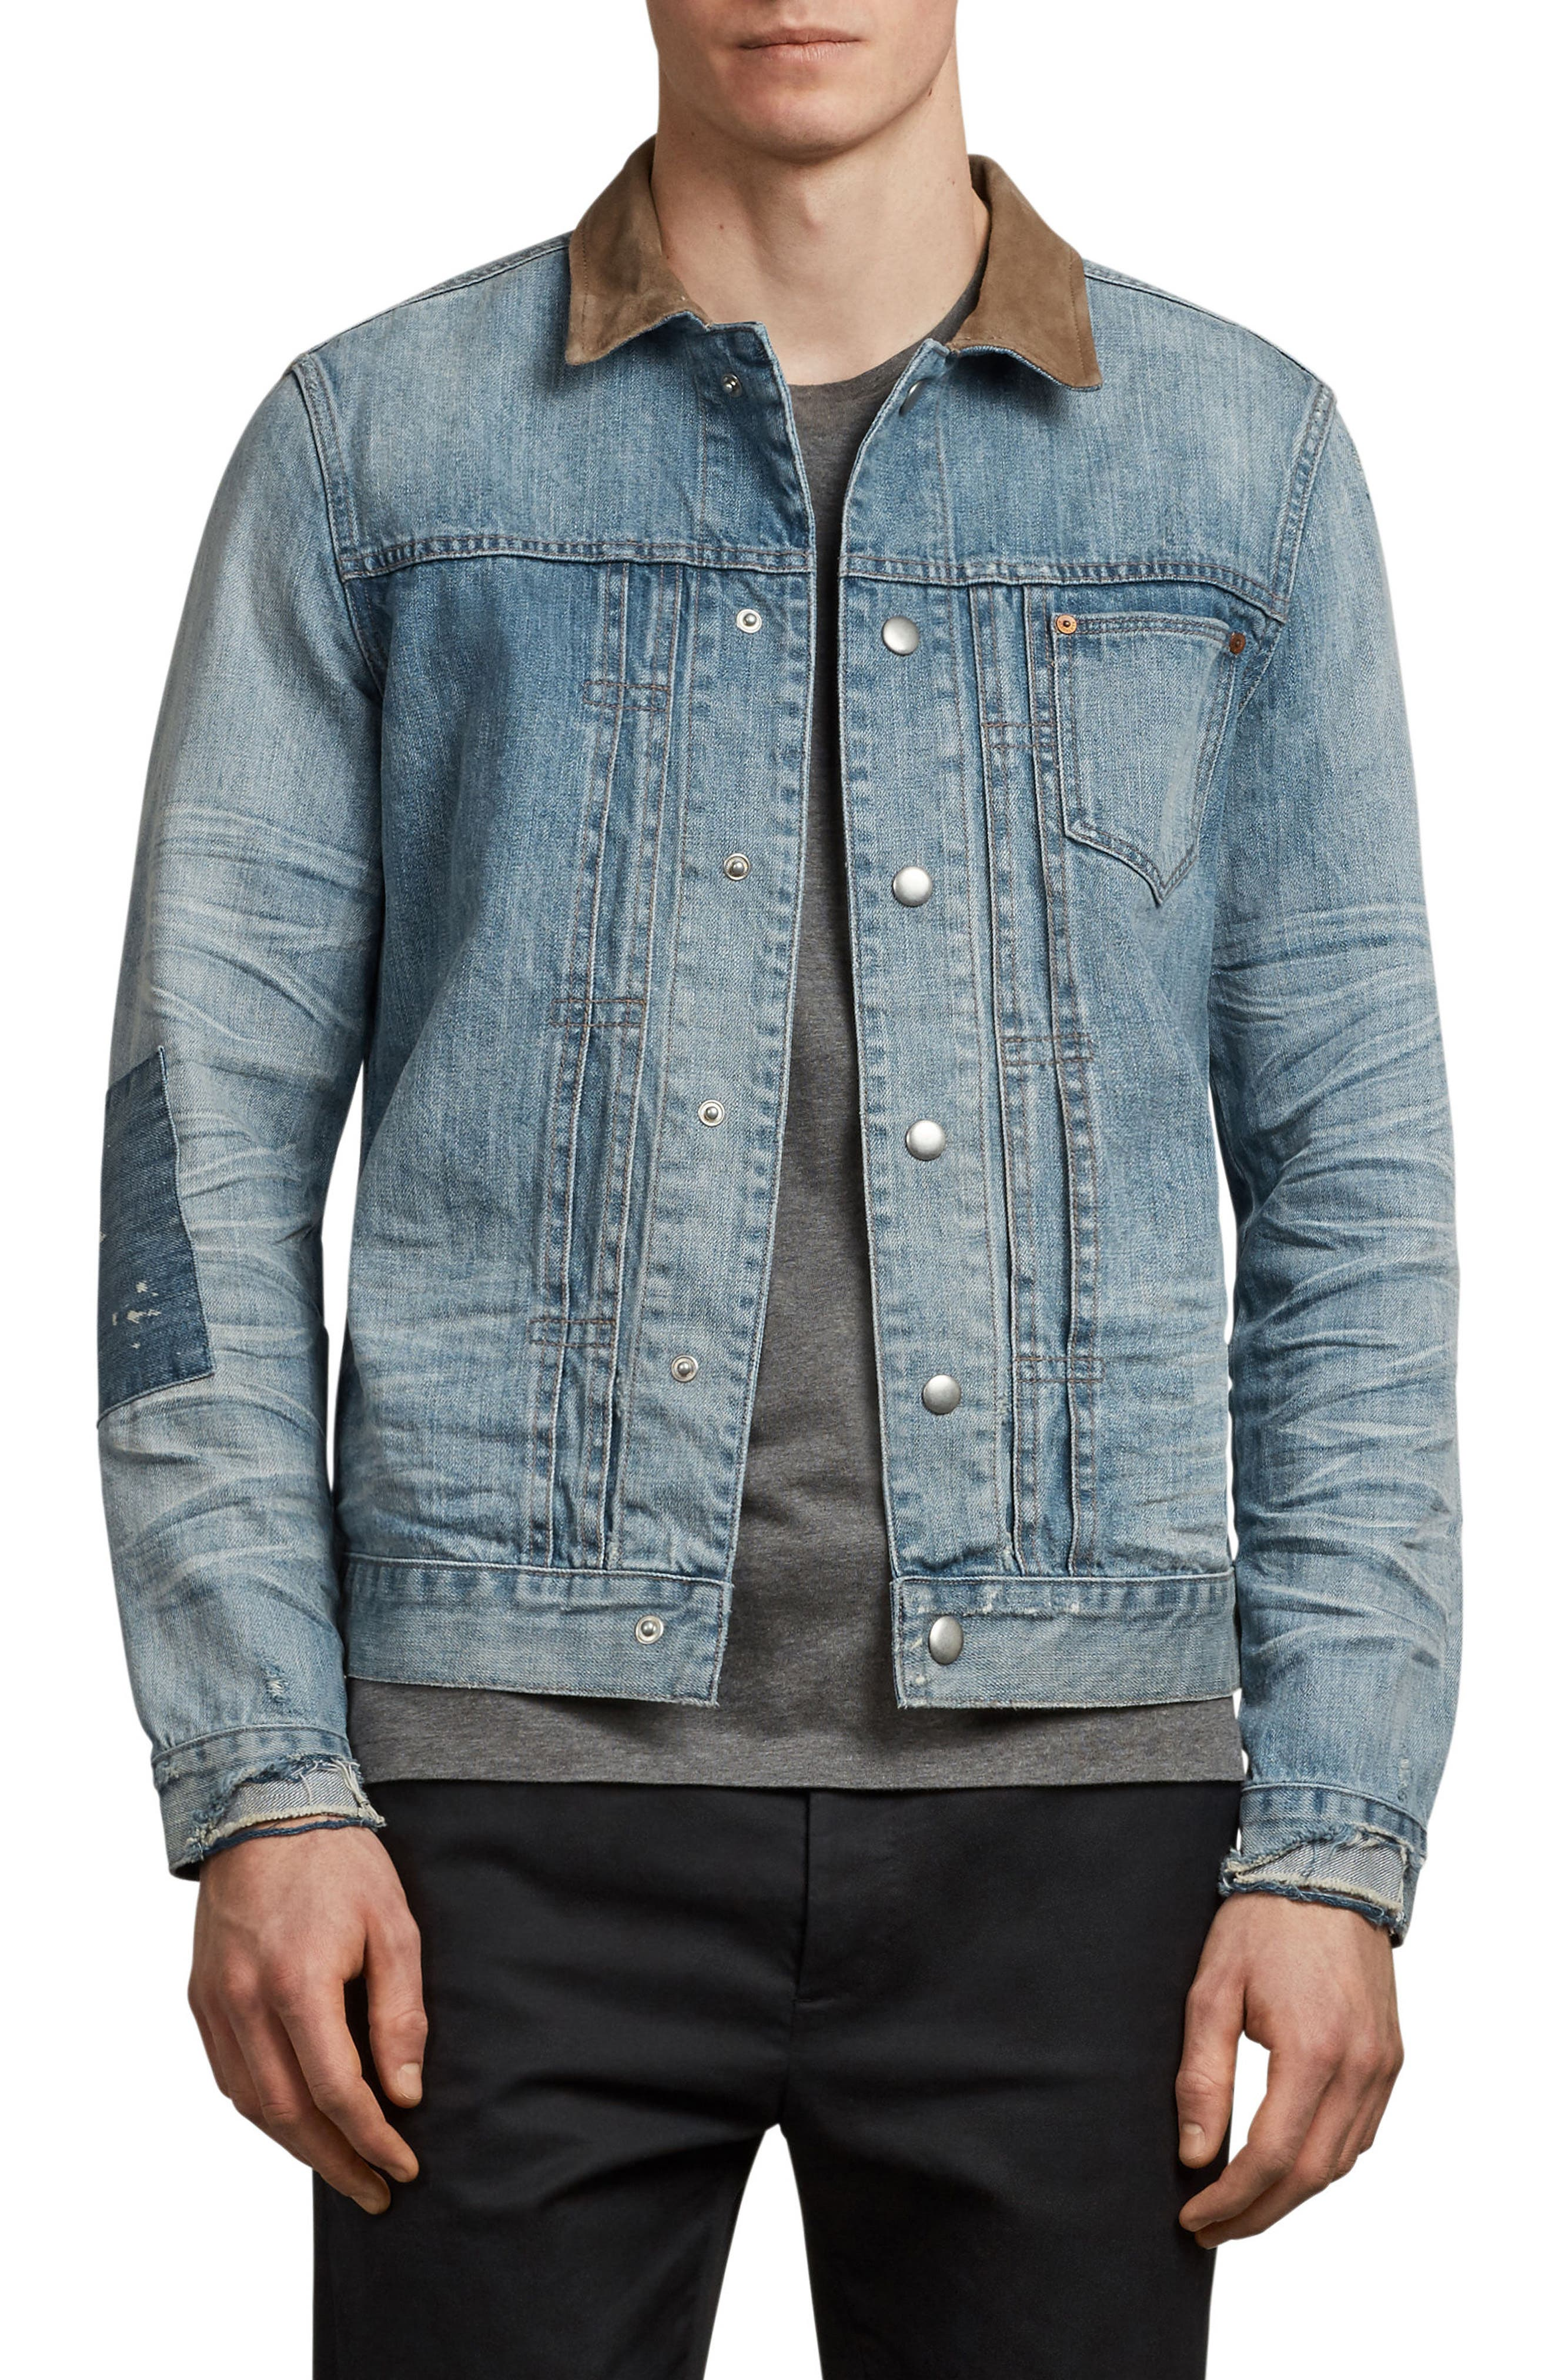 Ibanex Slim Fit Distressed Denim Jacket,                         Main,                         color, Indigo